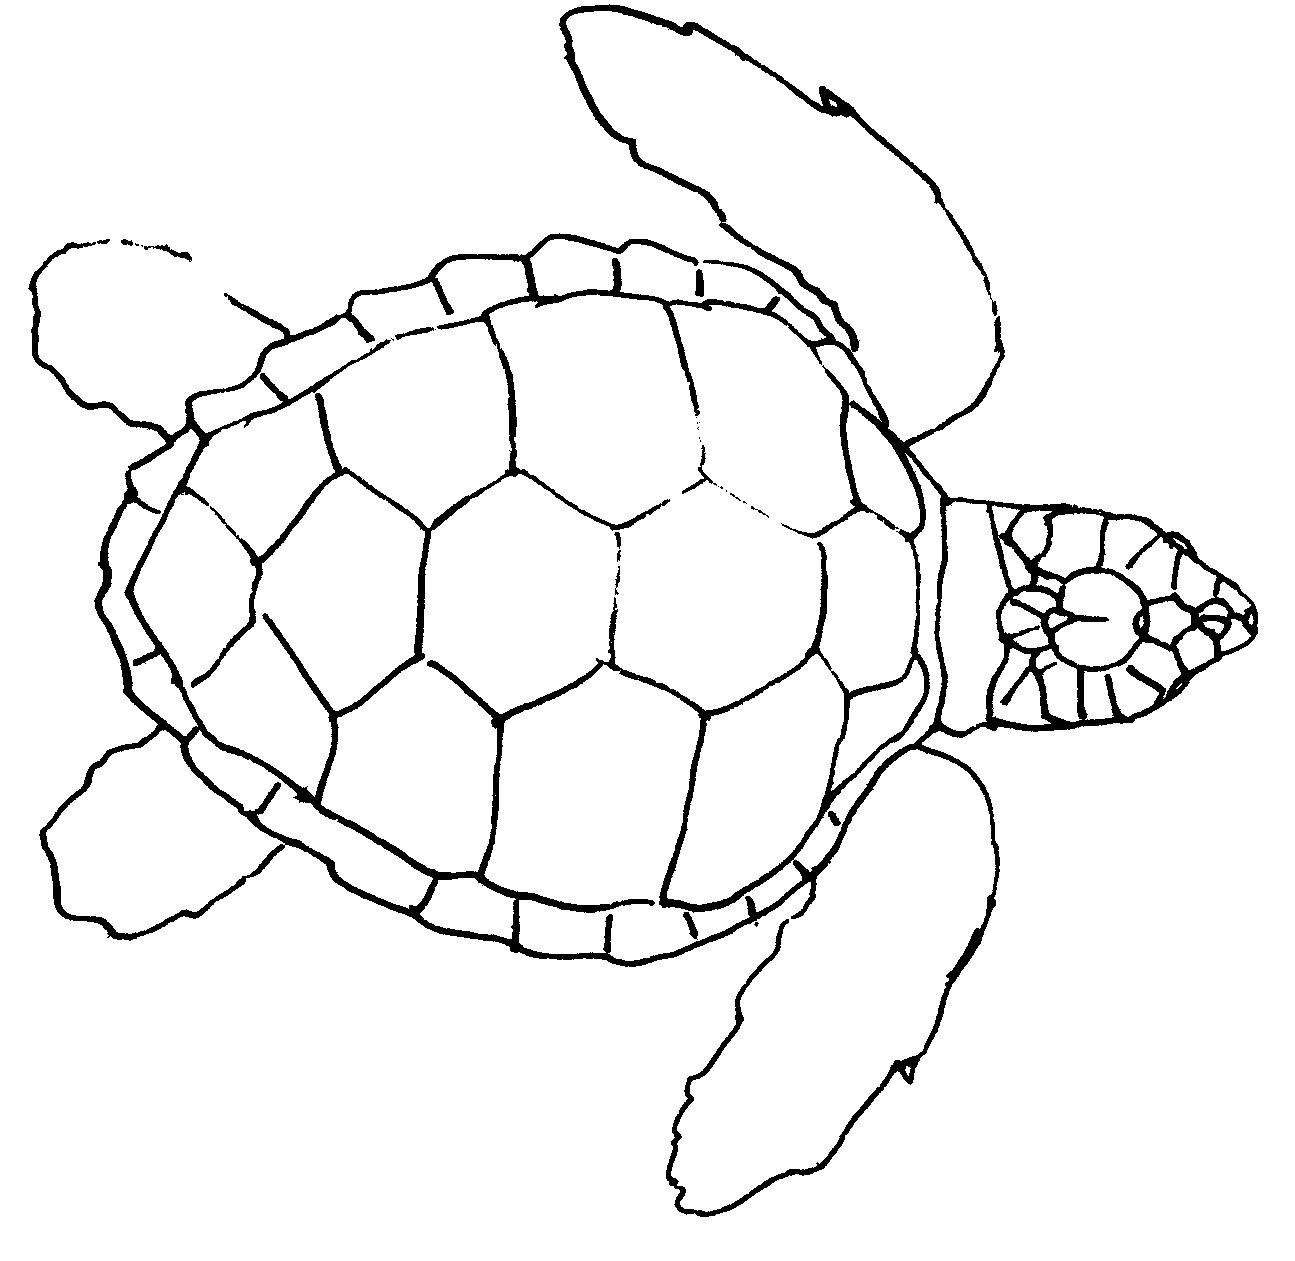 Drawn sea turtle line drawing Turtle Drawing Sea view turtle